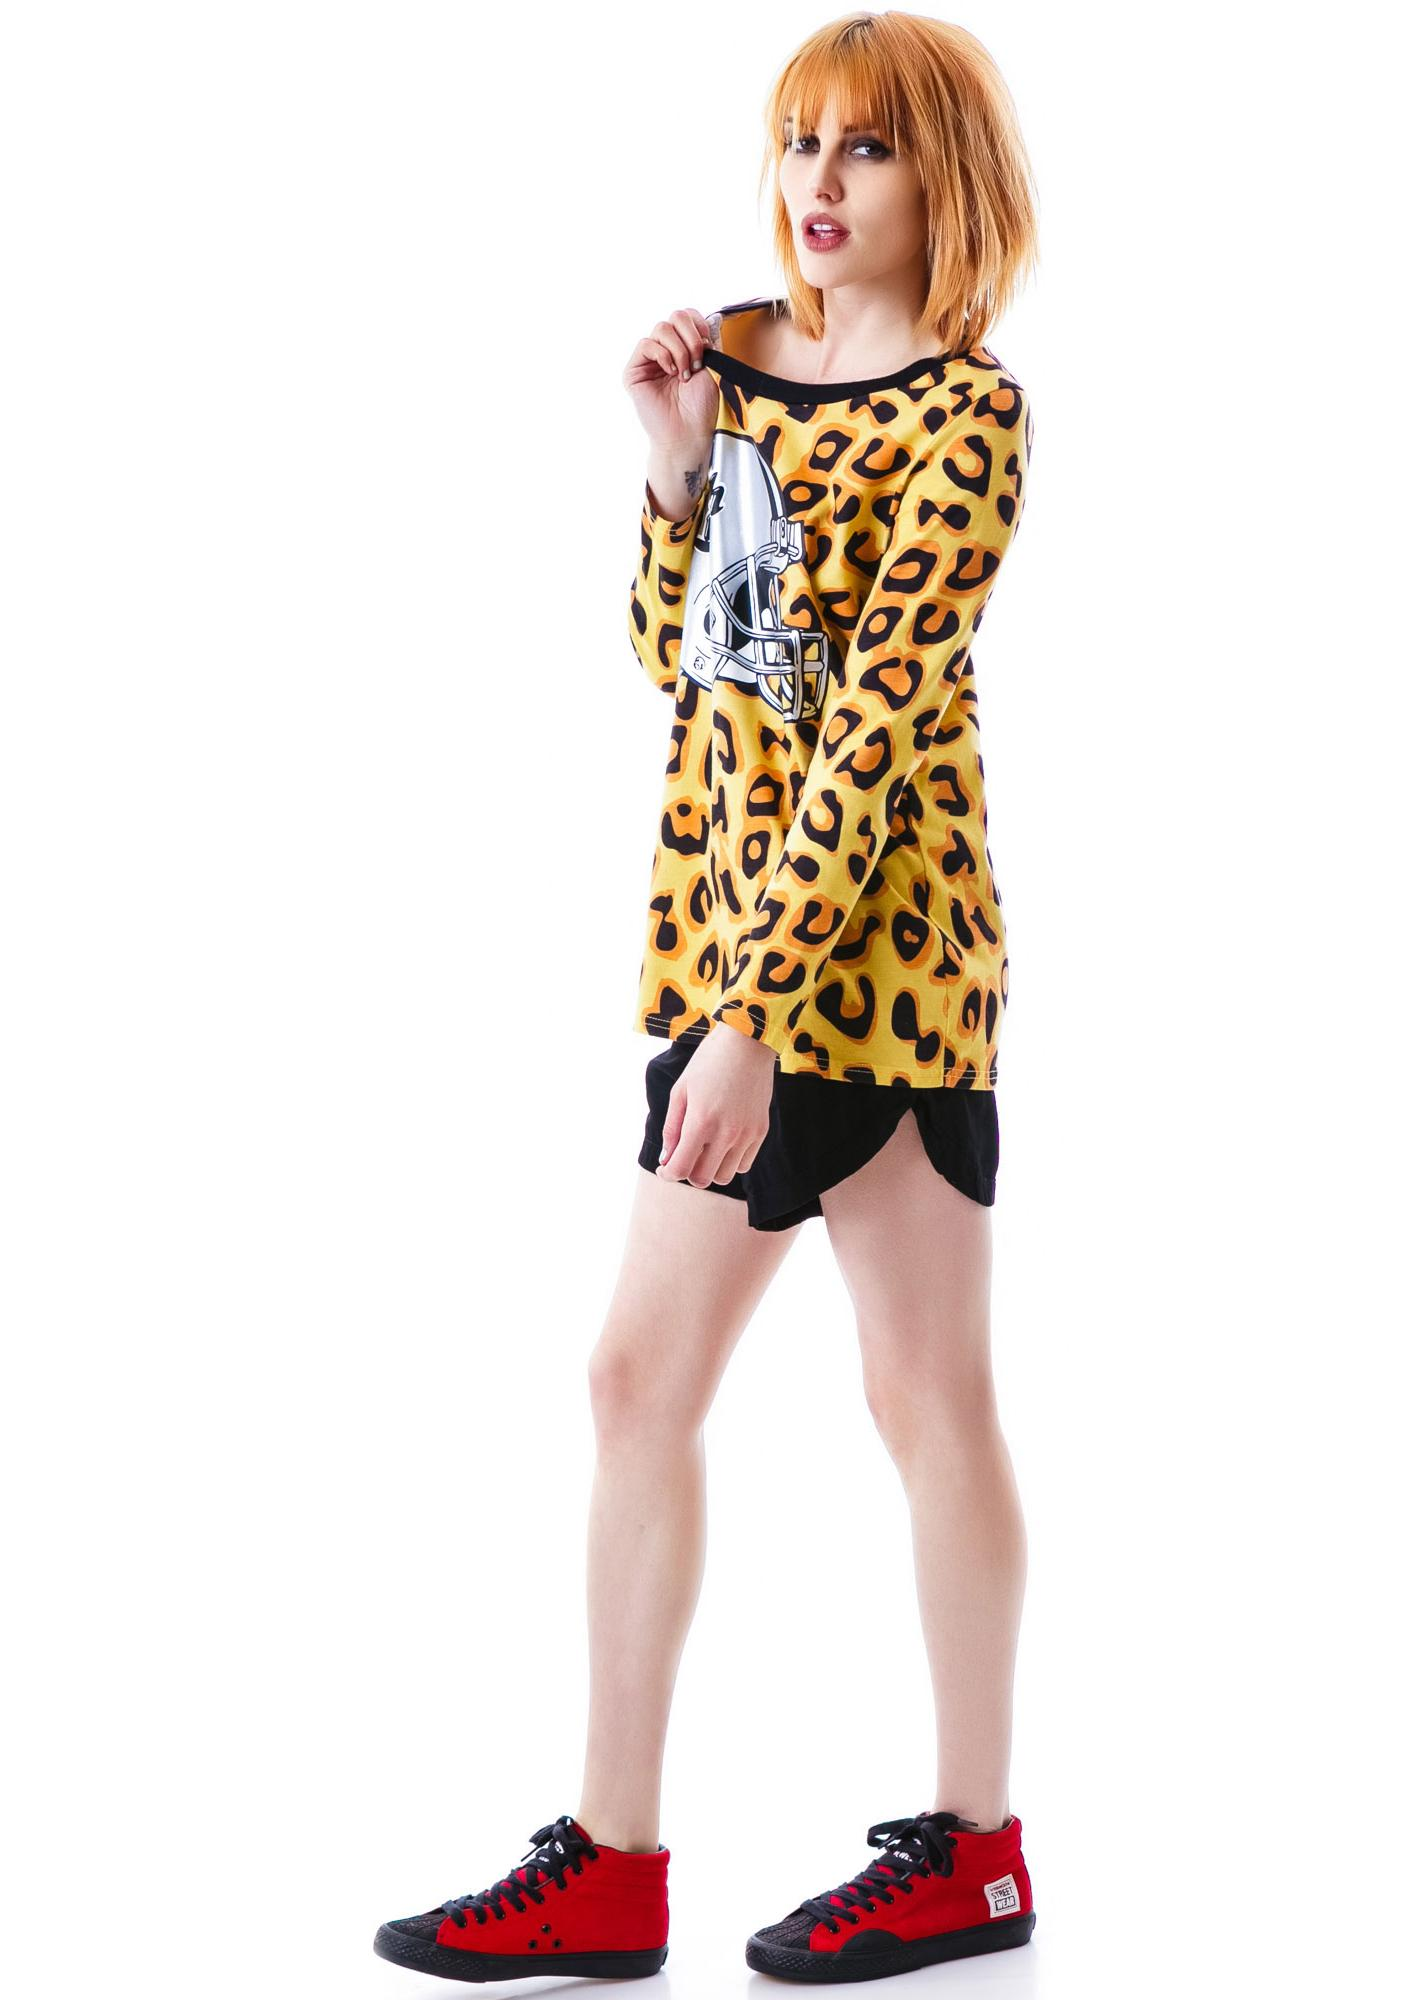 Joyrich Candy Leopard Helmet Long Sleeve Tee